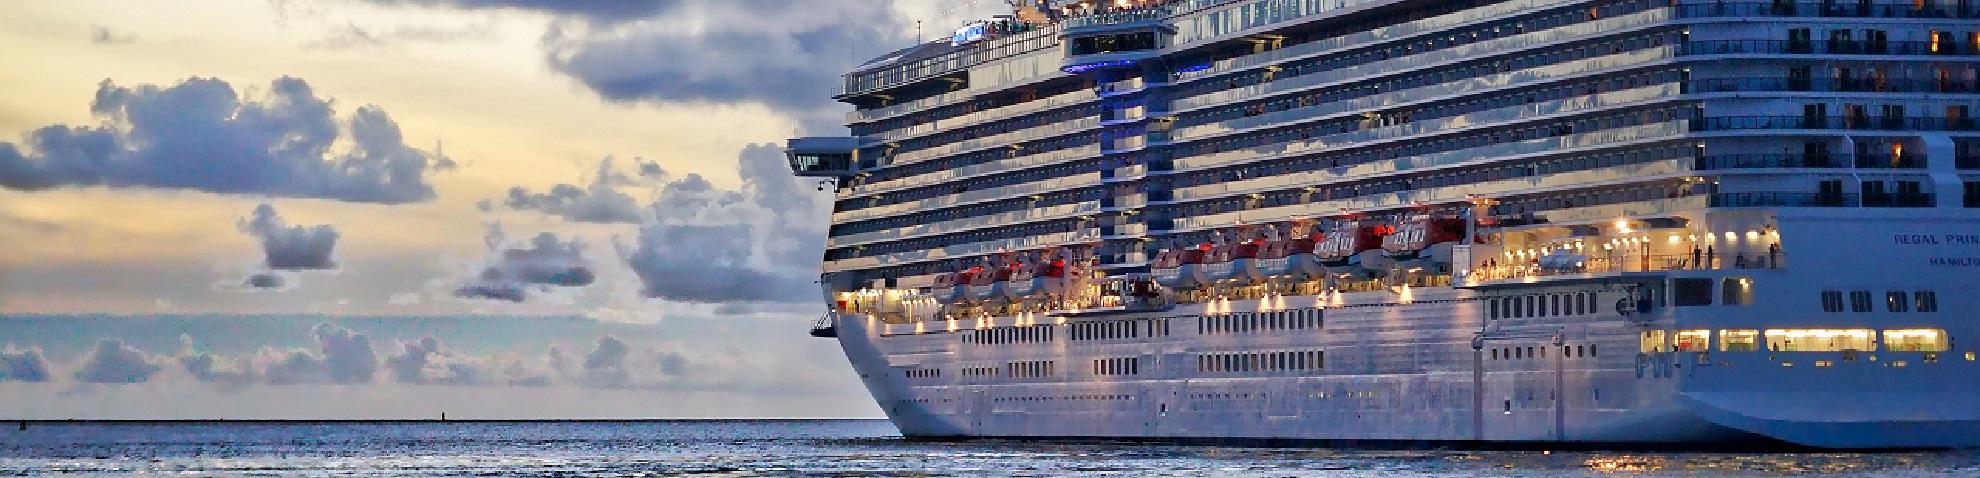 DigiMarCon Cruise